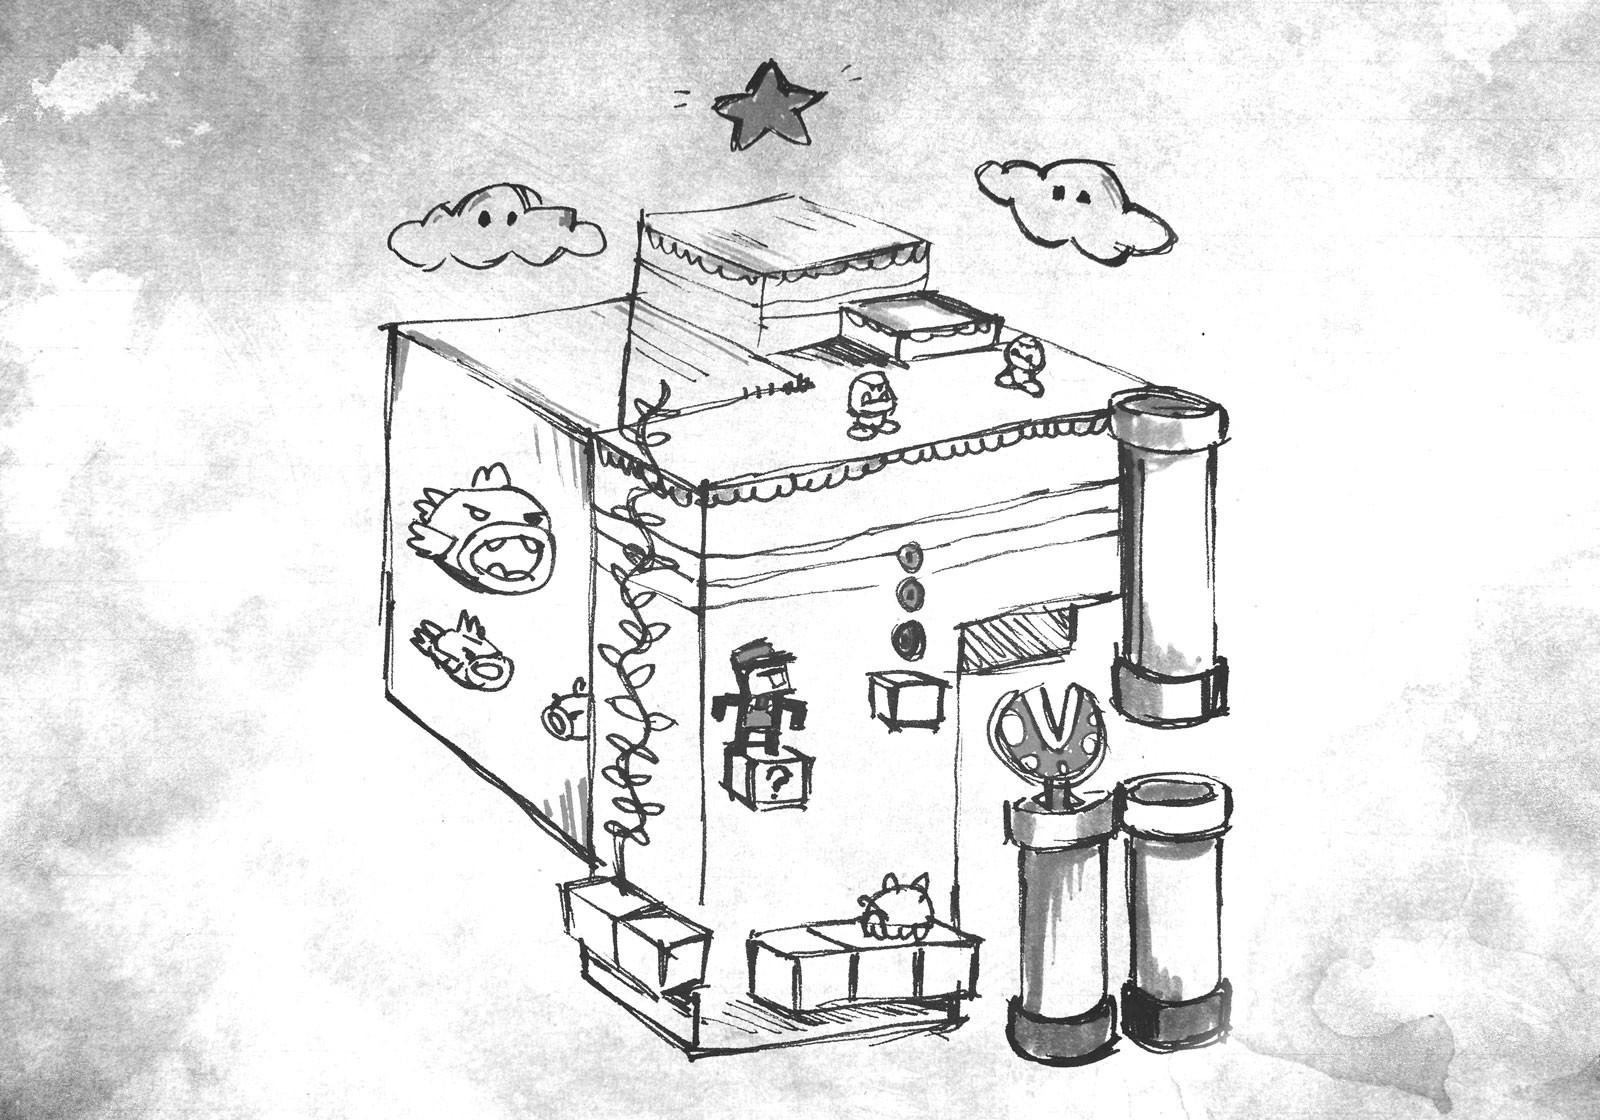 Super Mario Fan Art Drawing